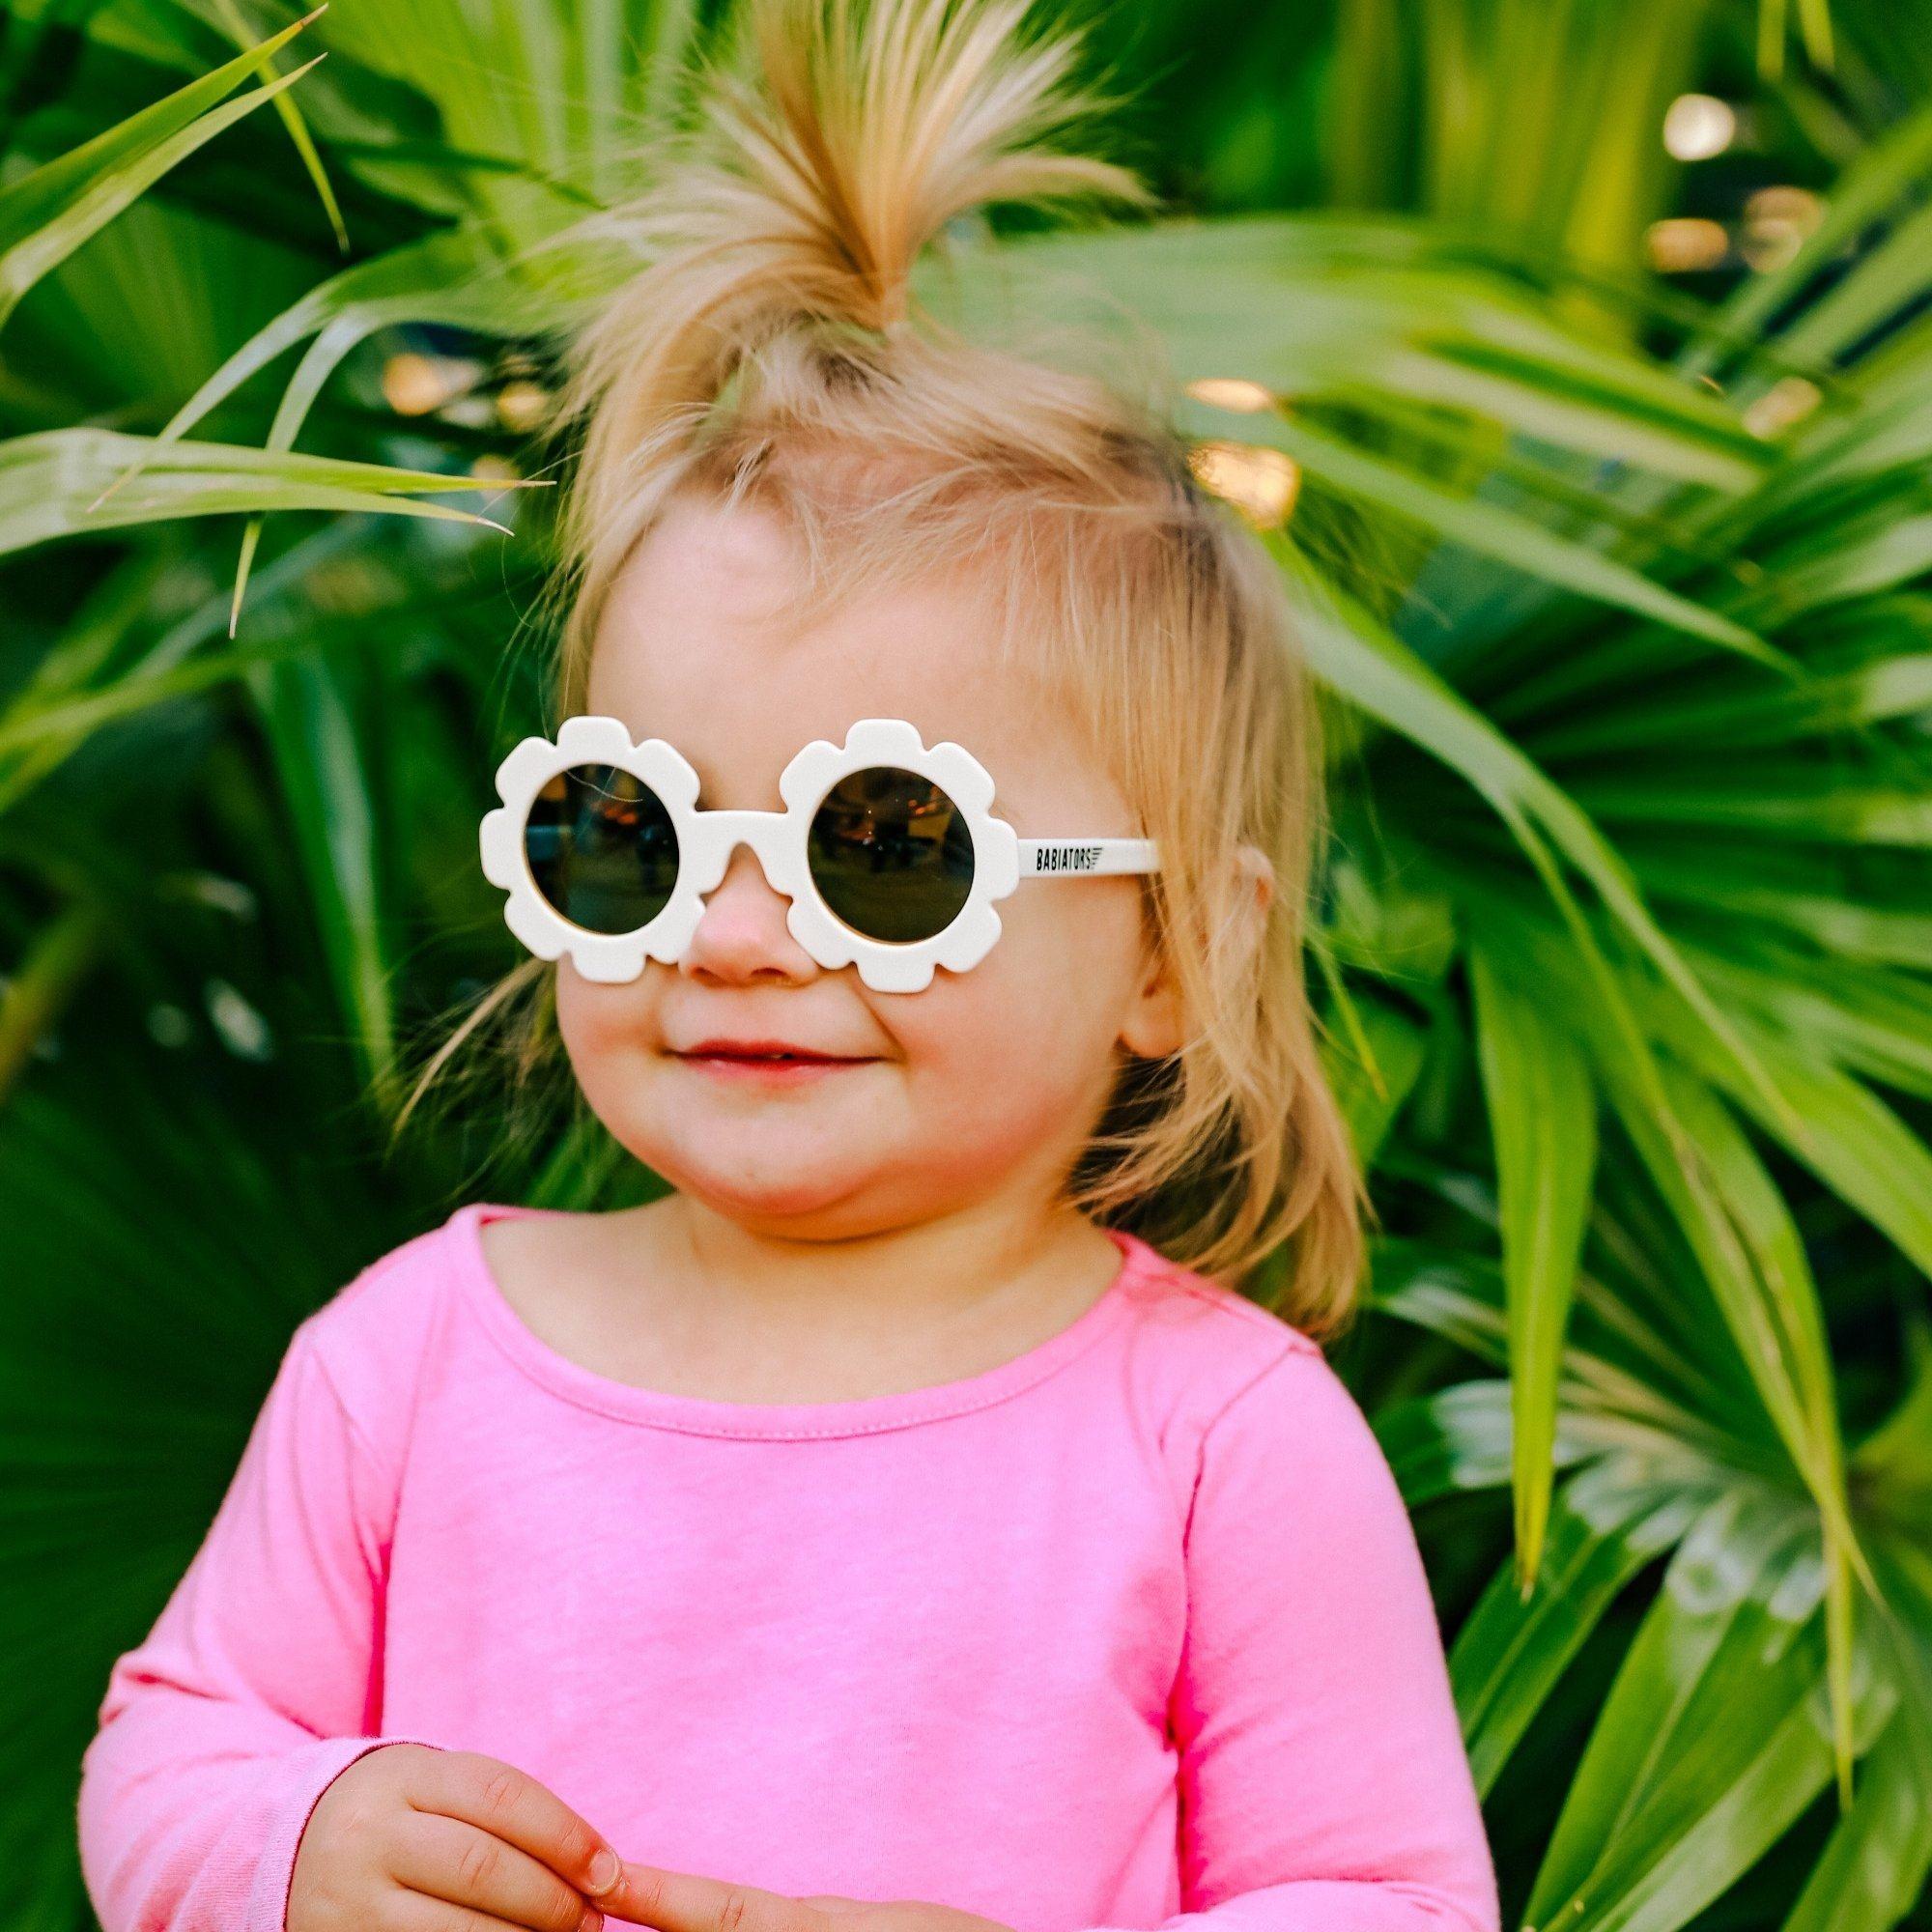 Babiators Babiators The Flower Child White -  Flower-Shaped Polarized Baby & Child Sunglasses with Mirrored Lenses